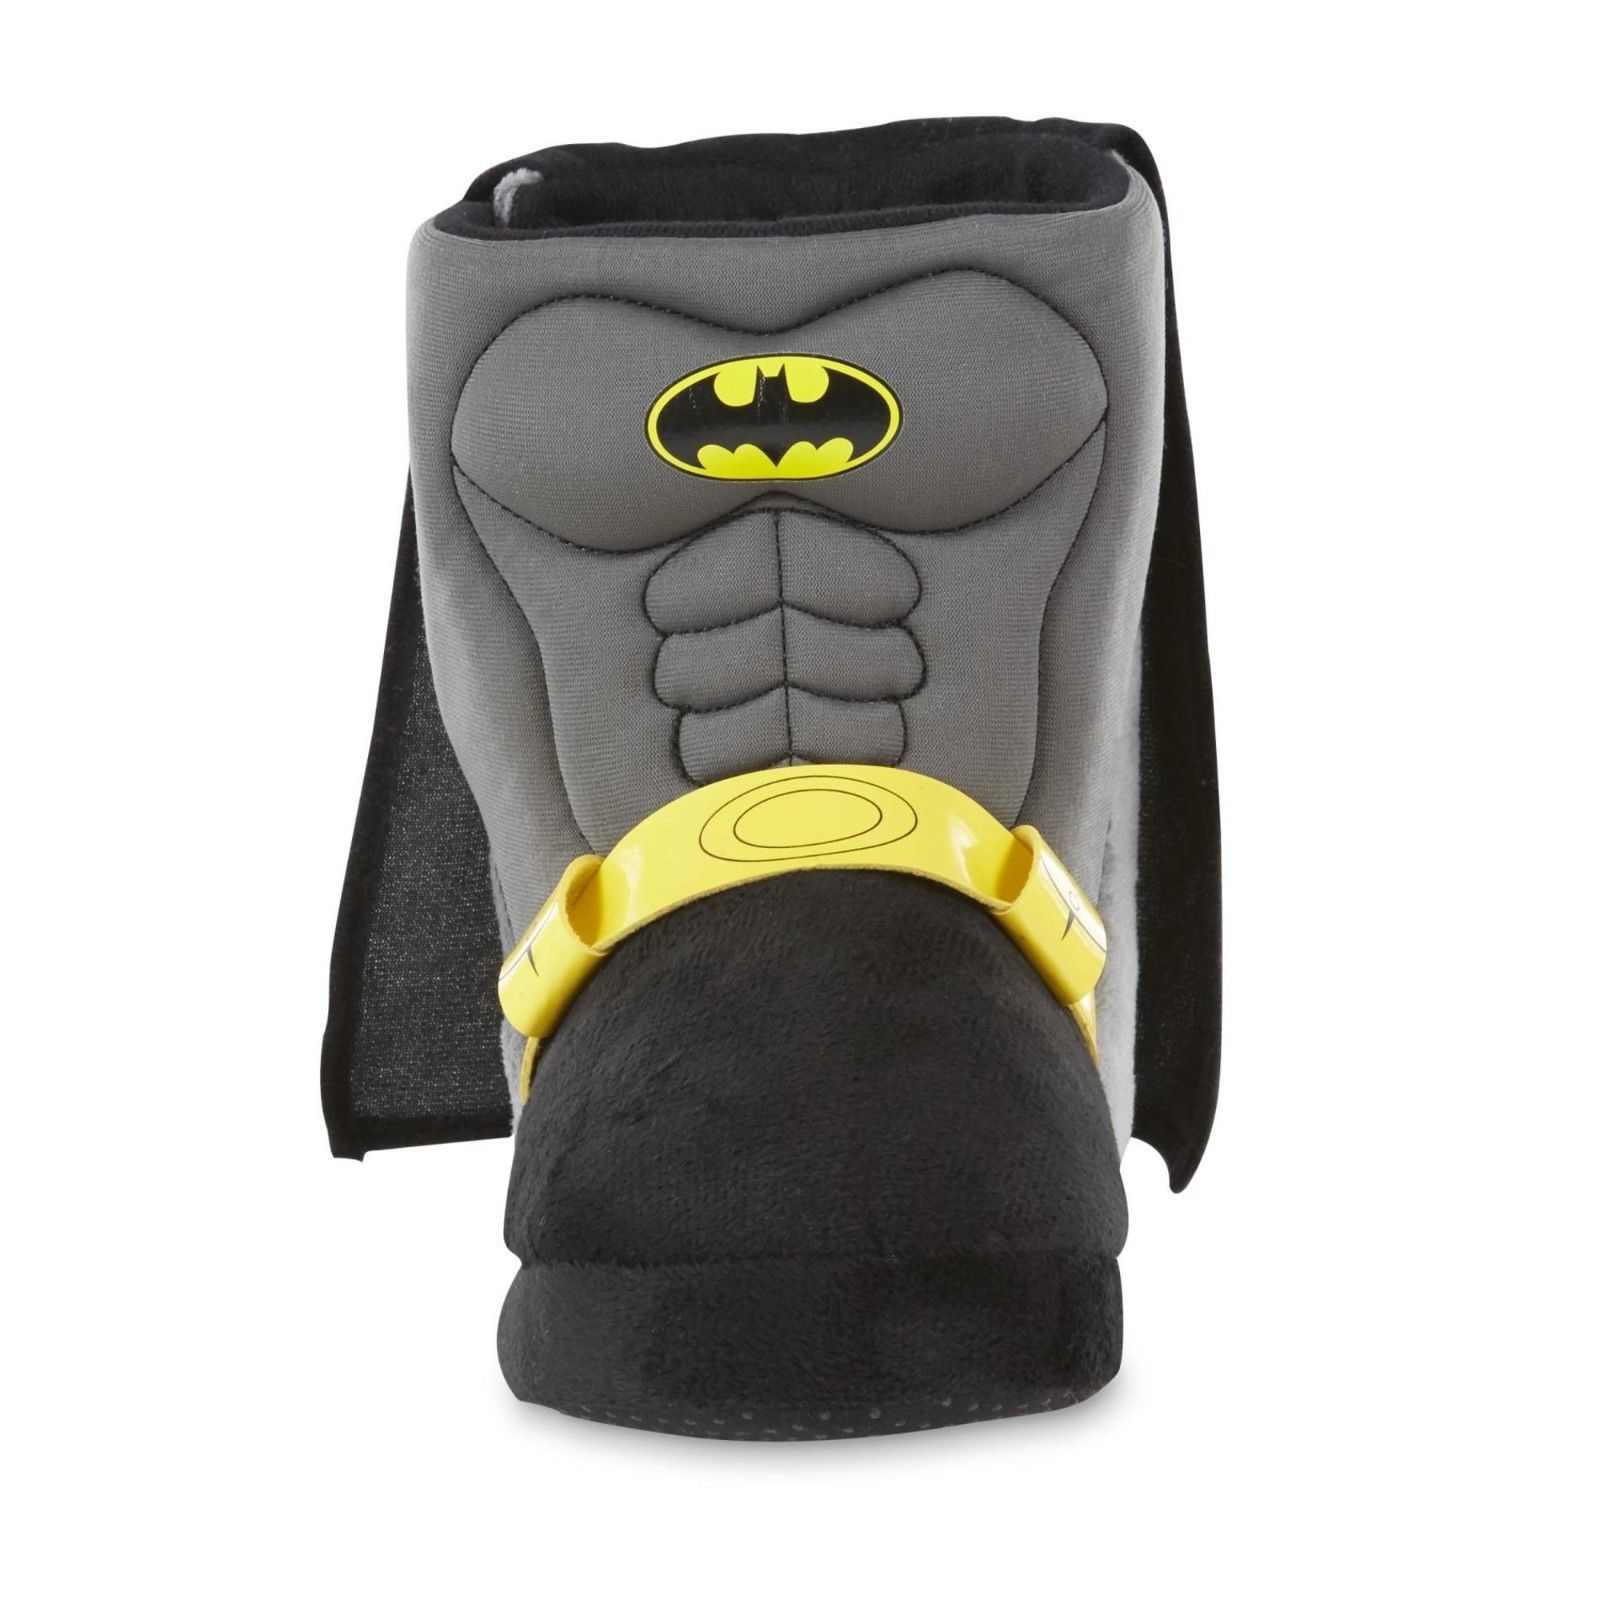 DC Comics Batman Slippers Slip On Cape Bat Symbol Size 7/8 9/10 11/12 2/3